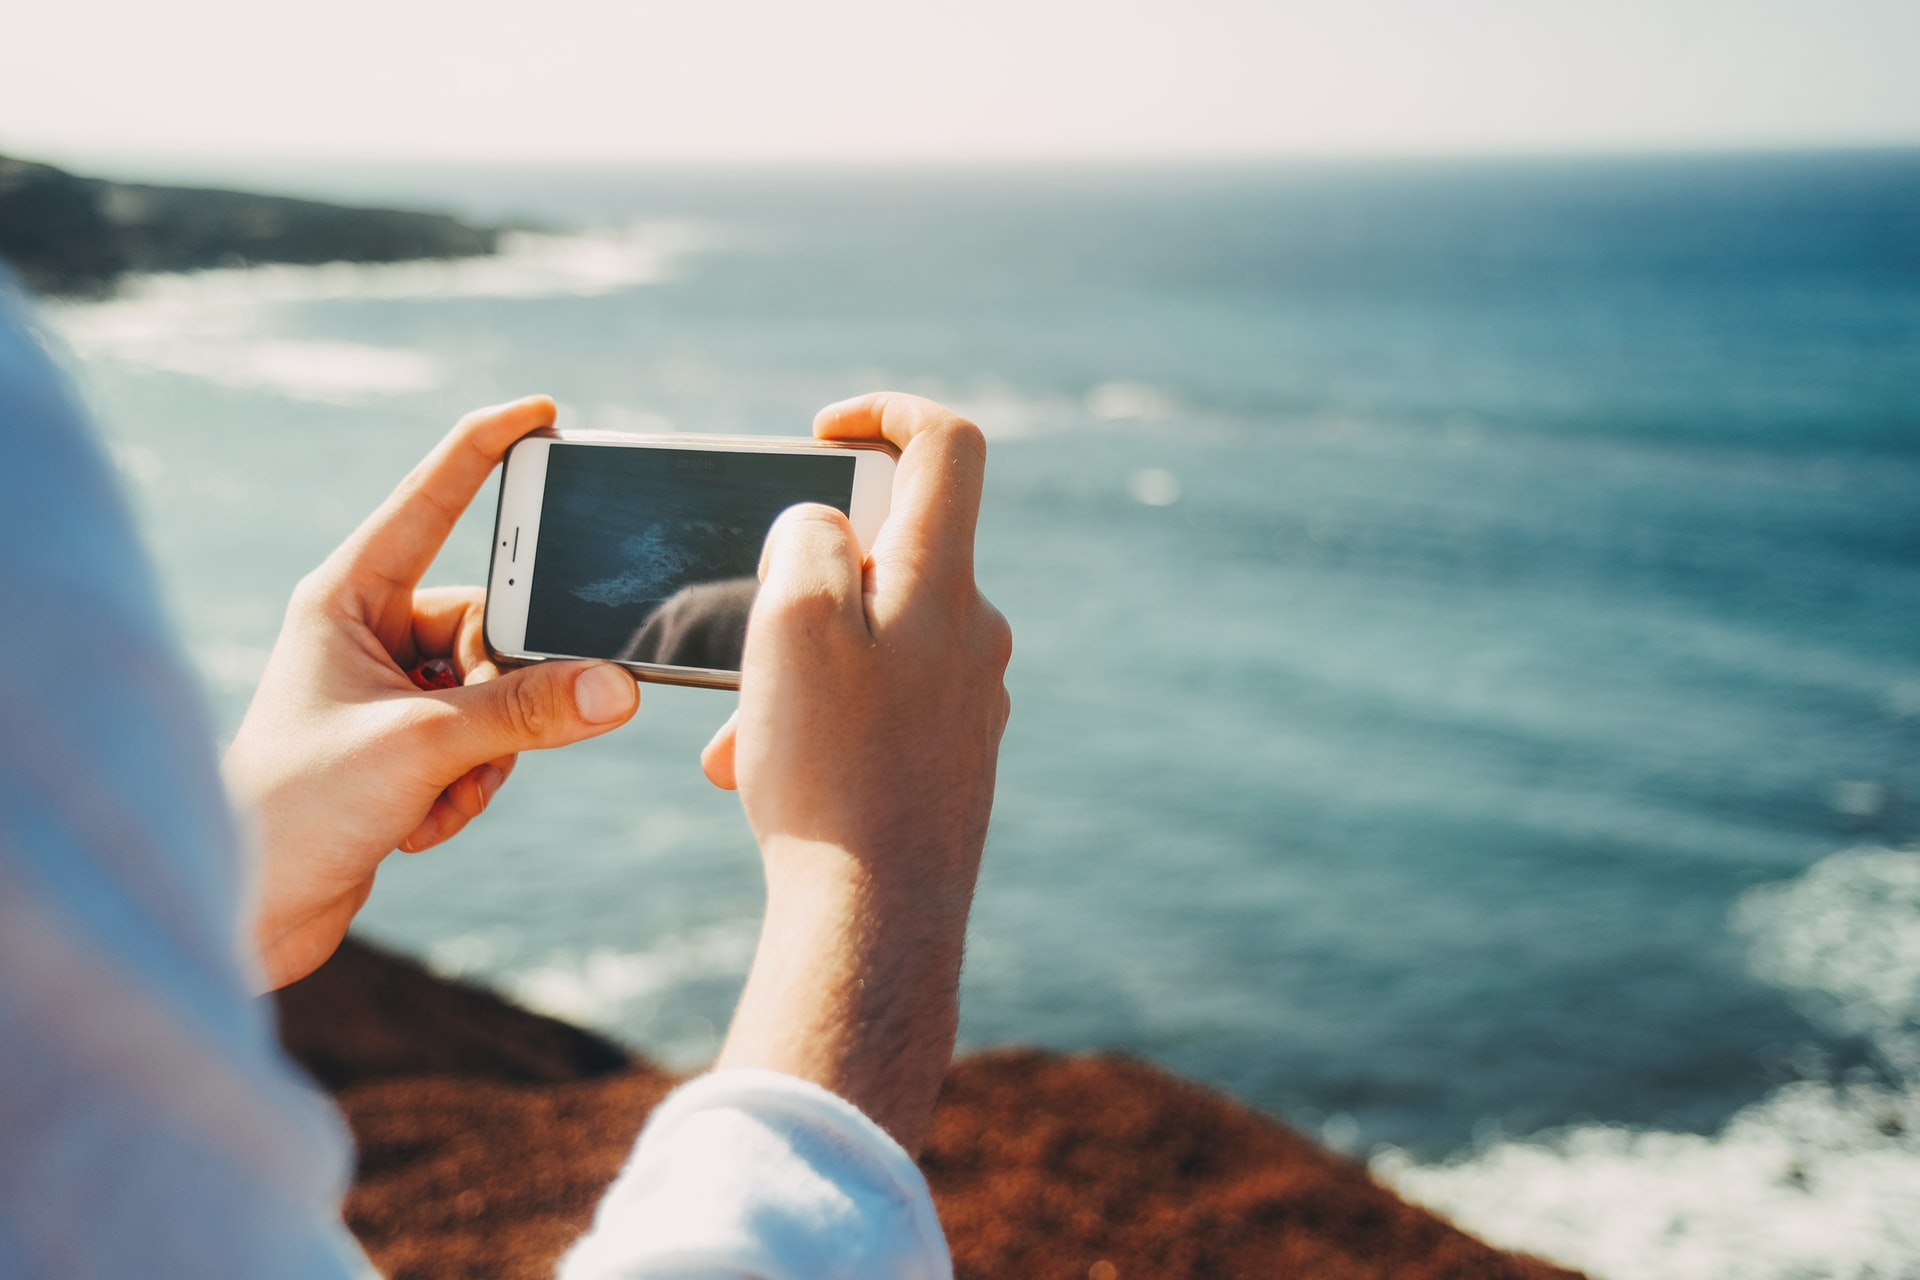 Androidユーザーにおすすめのモバイル保険|特徴やメリットを紹介